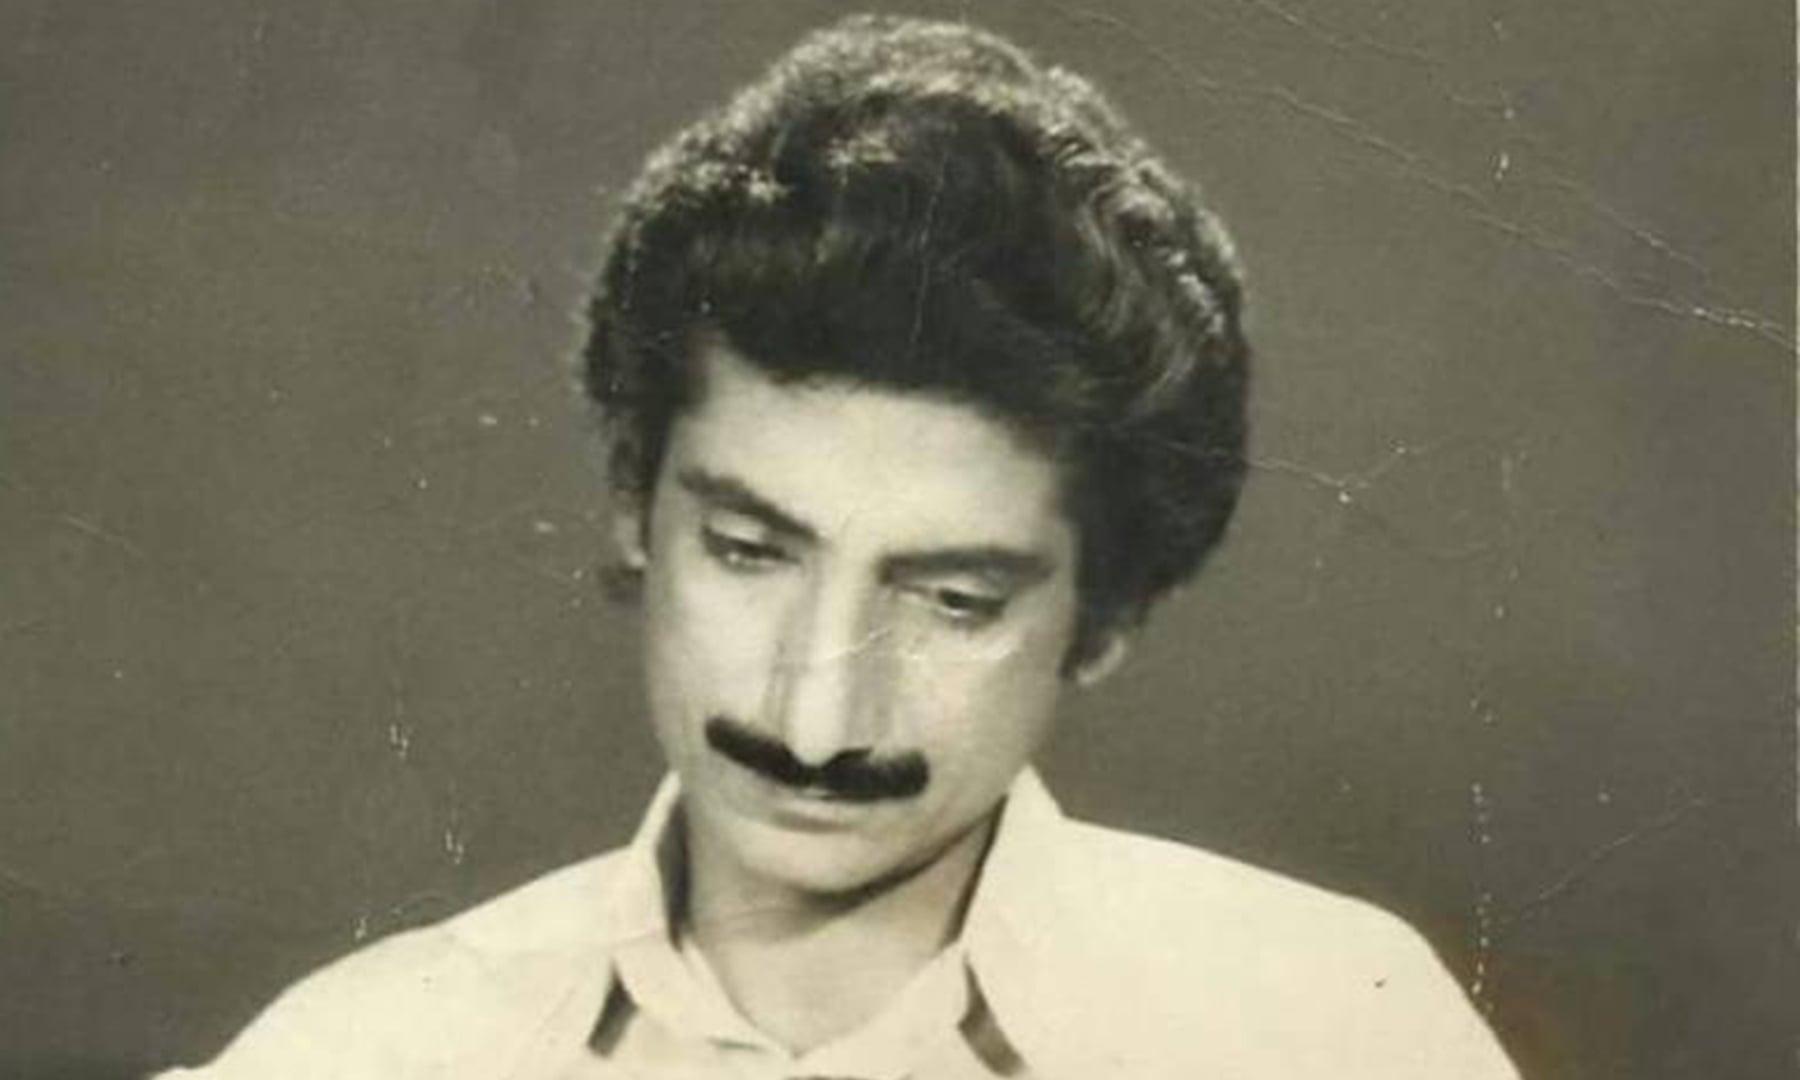 نوجوان صالح محمد شاہ عرف فتح خان — تصویر بشکریہ ریڈیو پاکستان